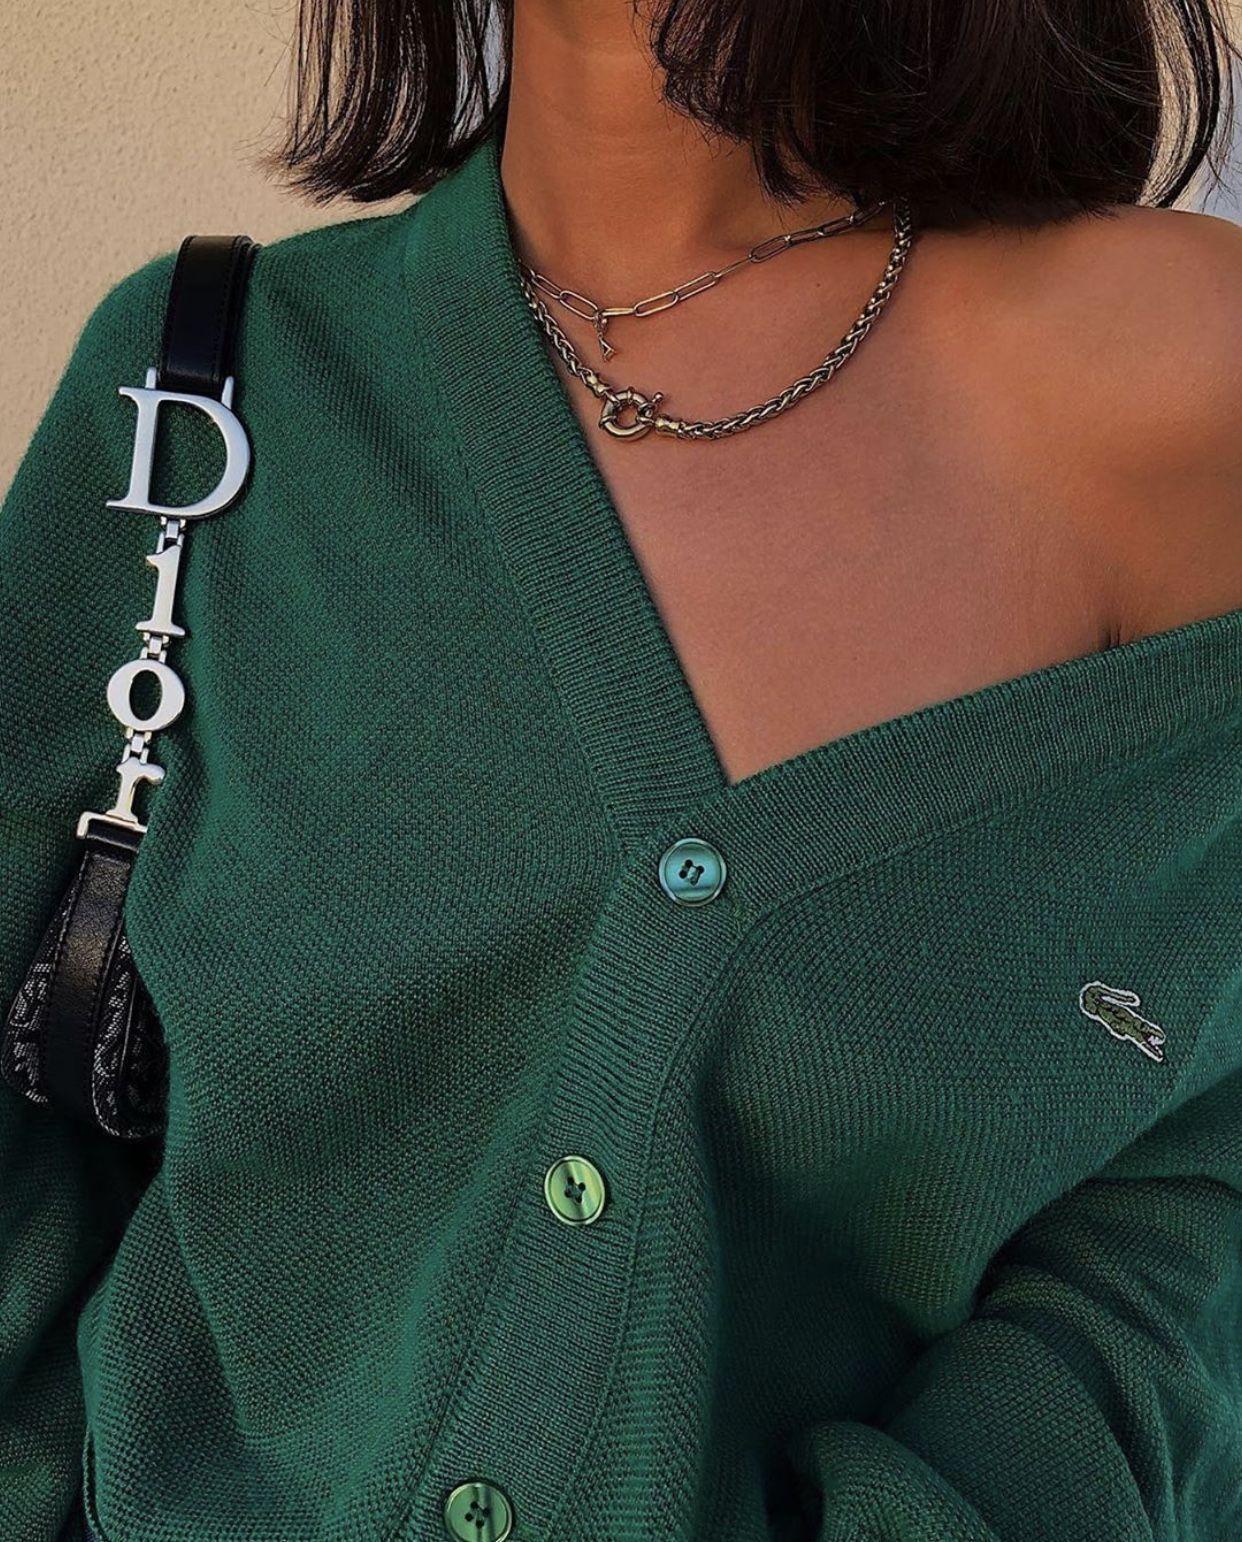 , –   – #accesoriesjewelry #beautifuljewelrydiy #beltdiyideas #diyJewelryaccessori…,  #acceso…, MySummer Combin Blog, MySummer Combin Blog